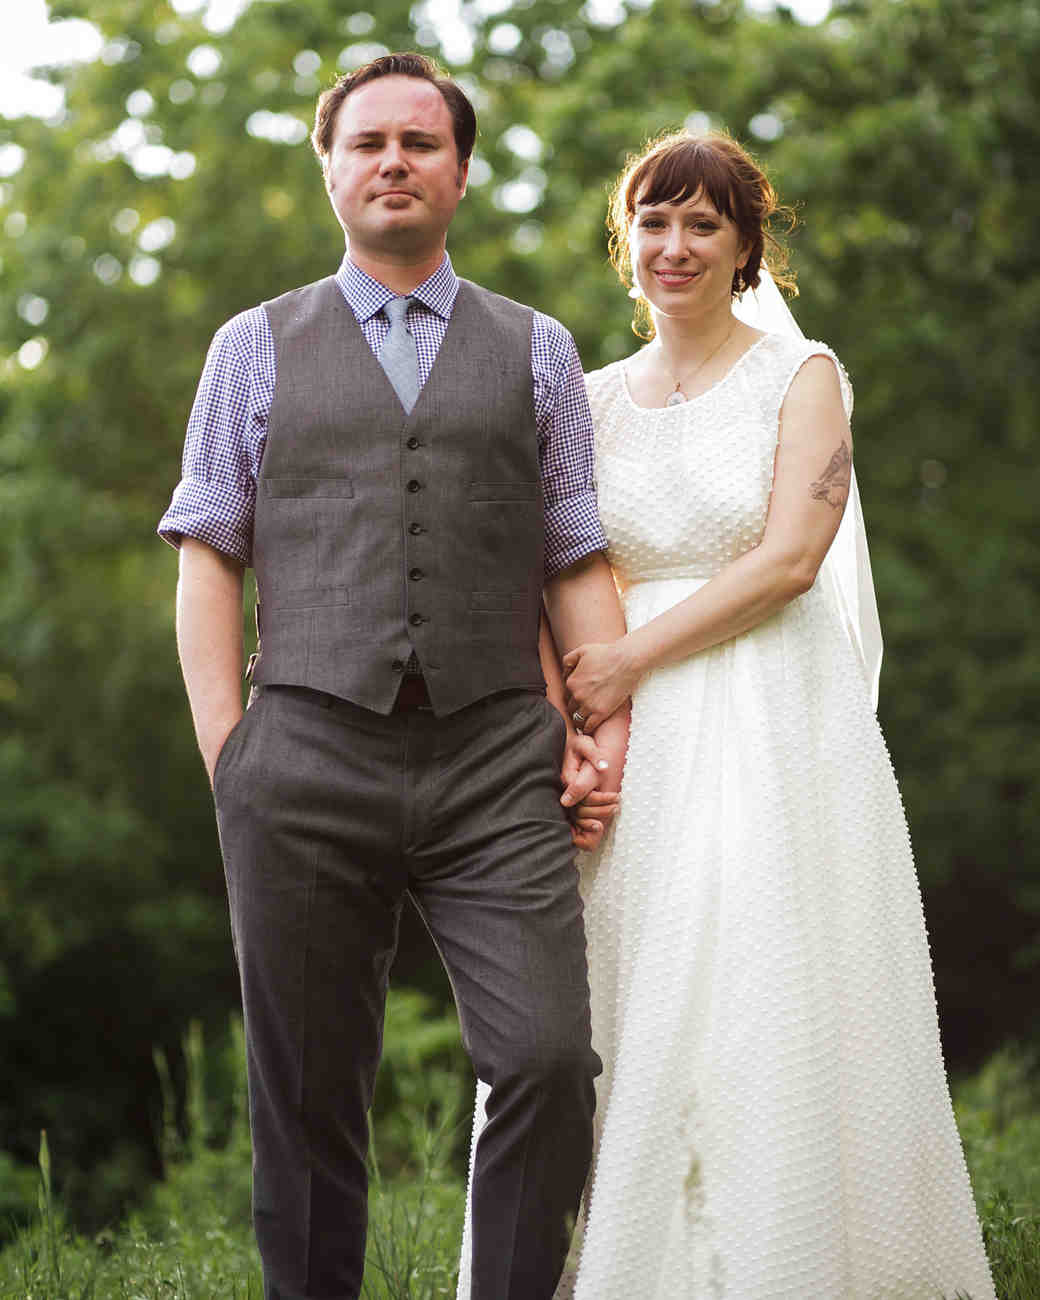 kelly-marie-dave-wedding-portrait2-0414.jpg